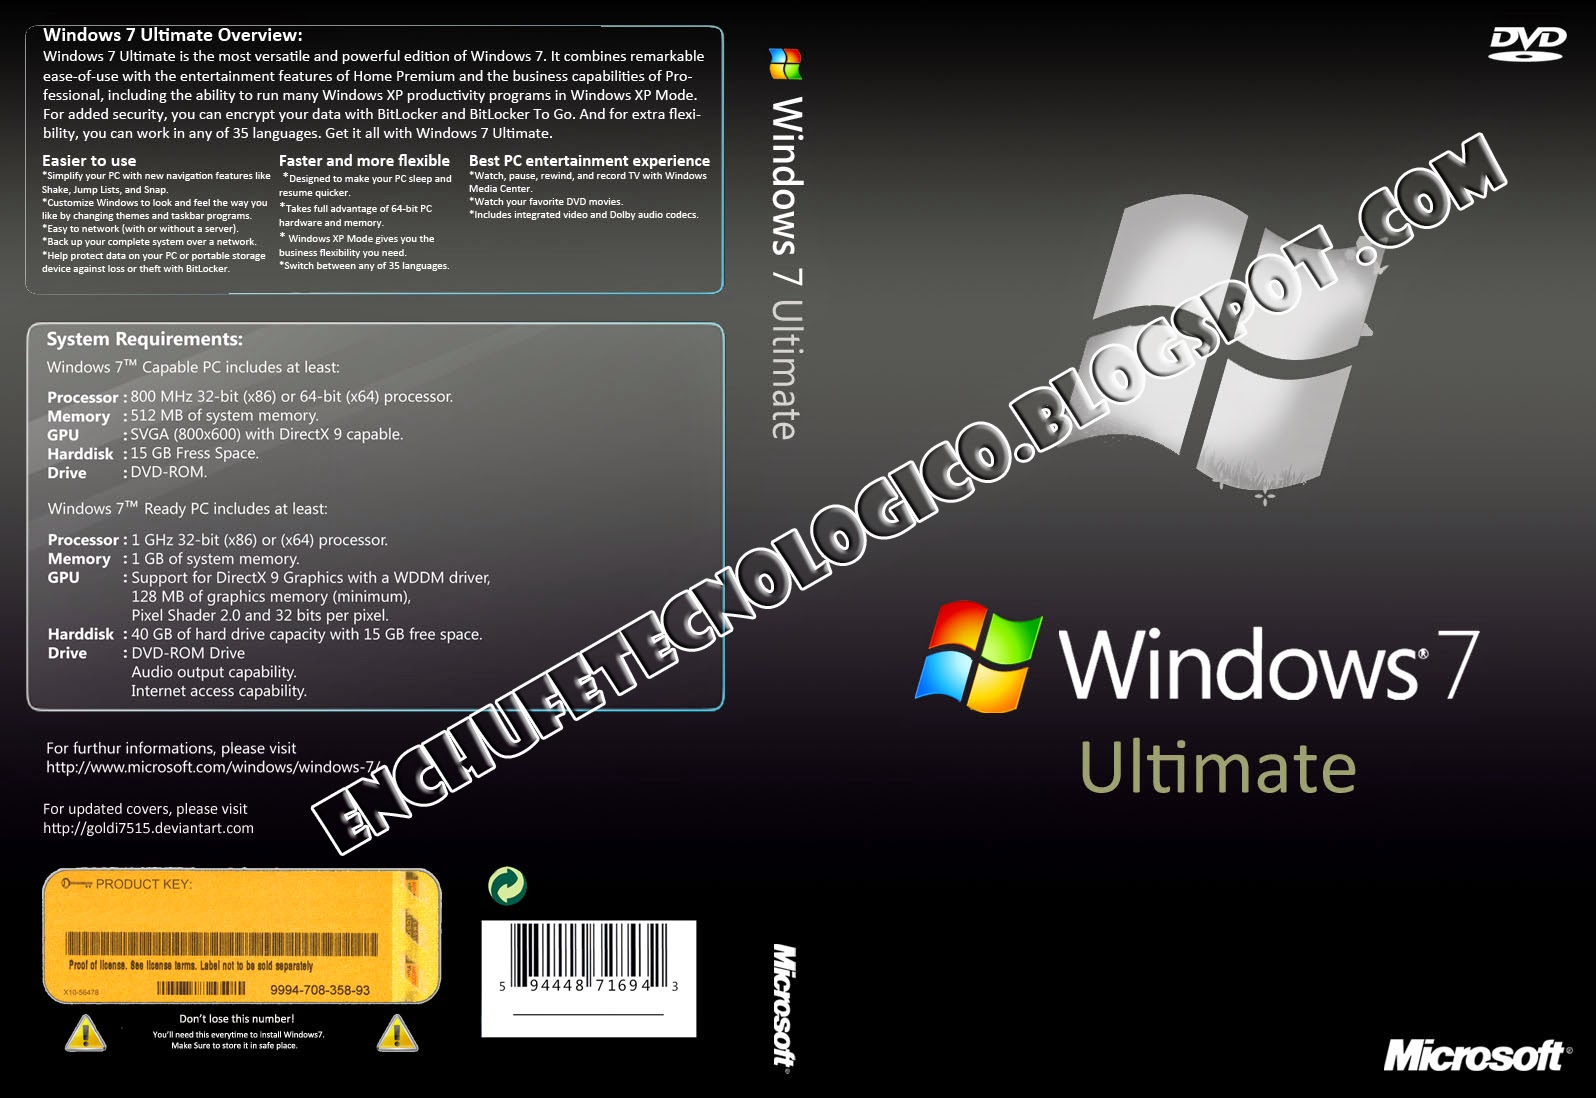 descargar imagen iso de windows 7 ultimate 32 bits